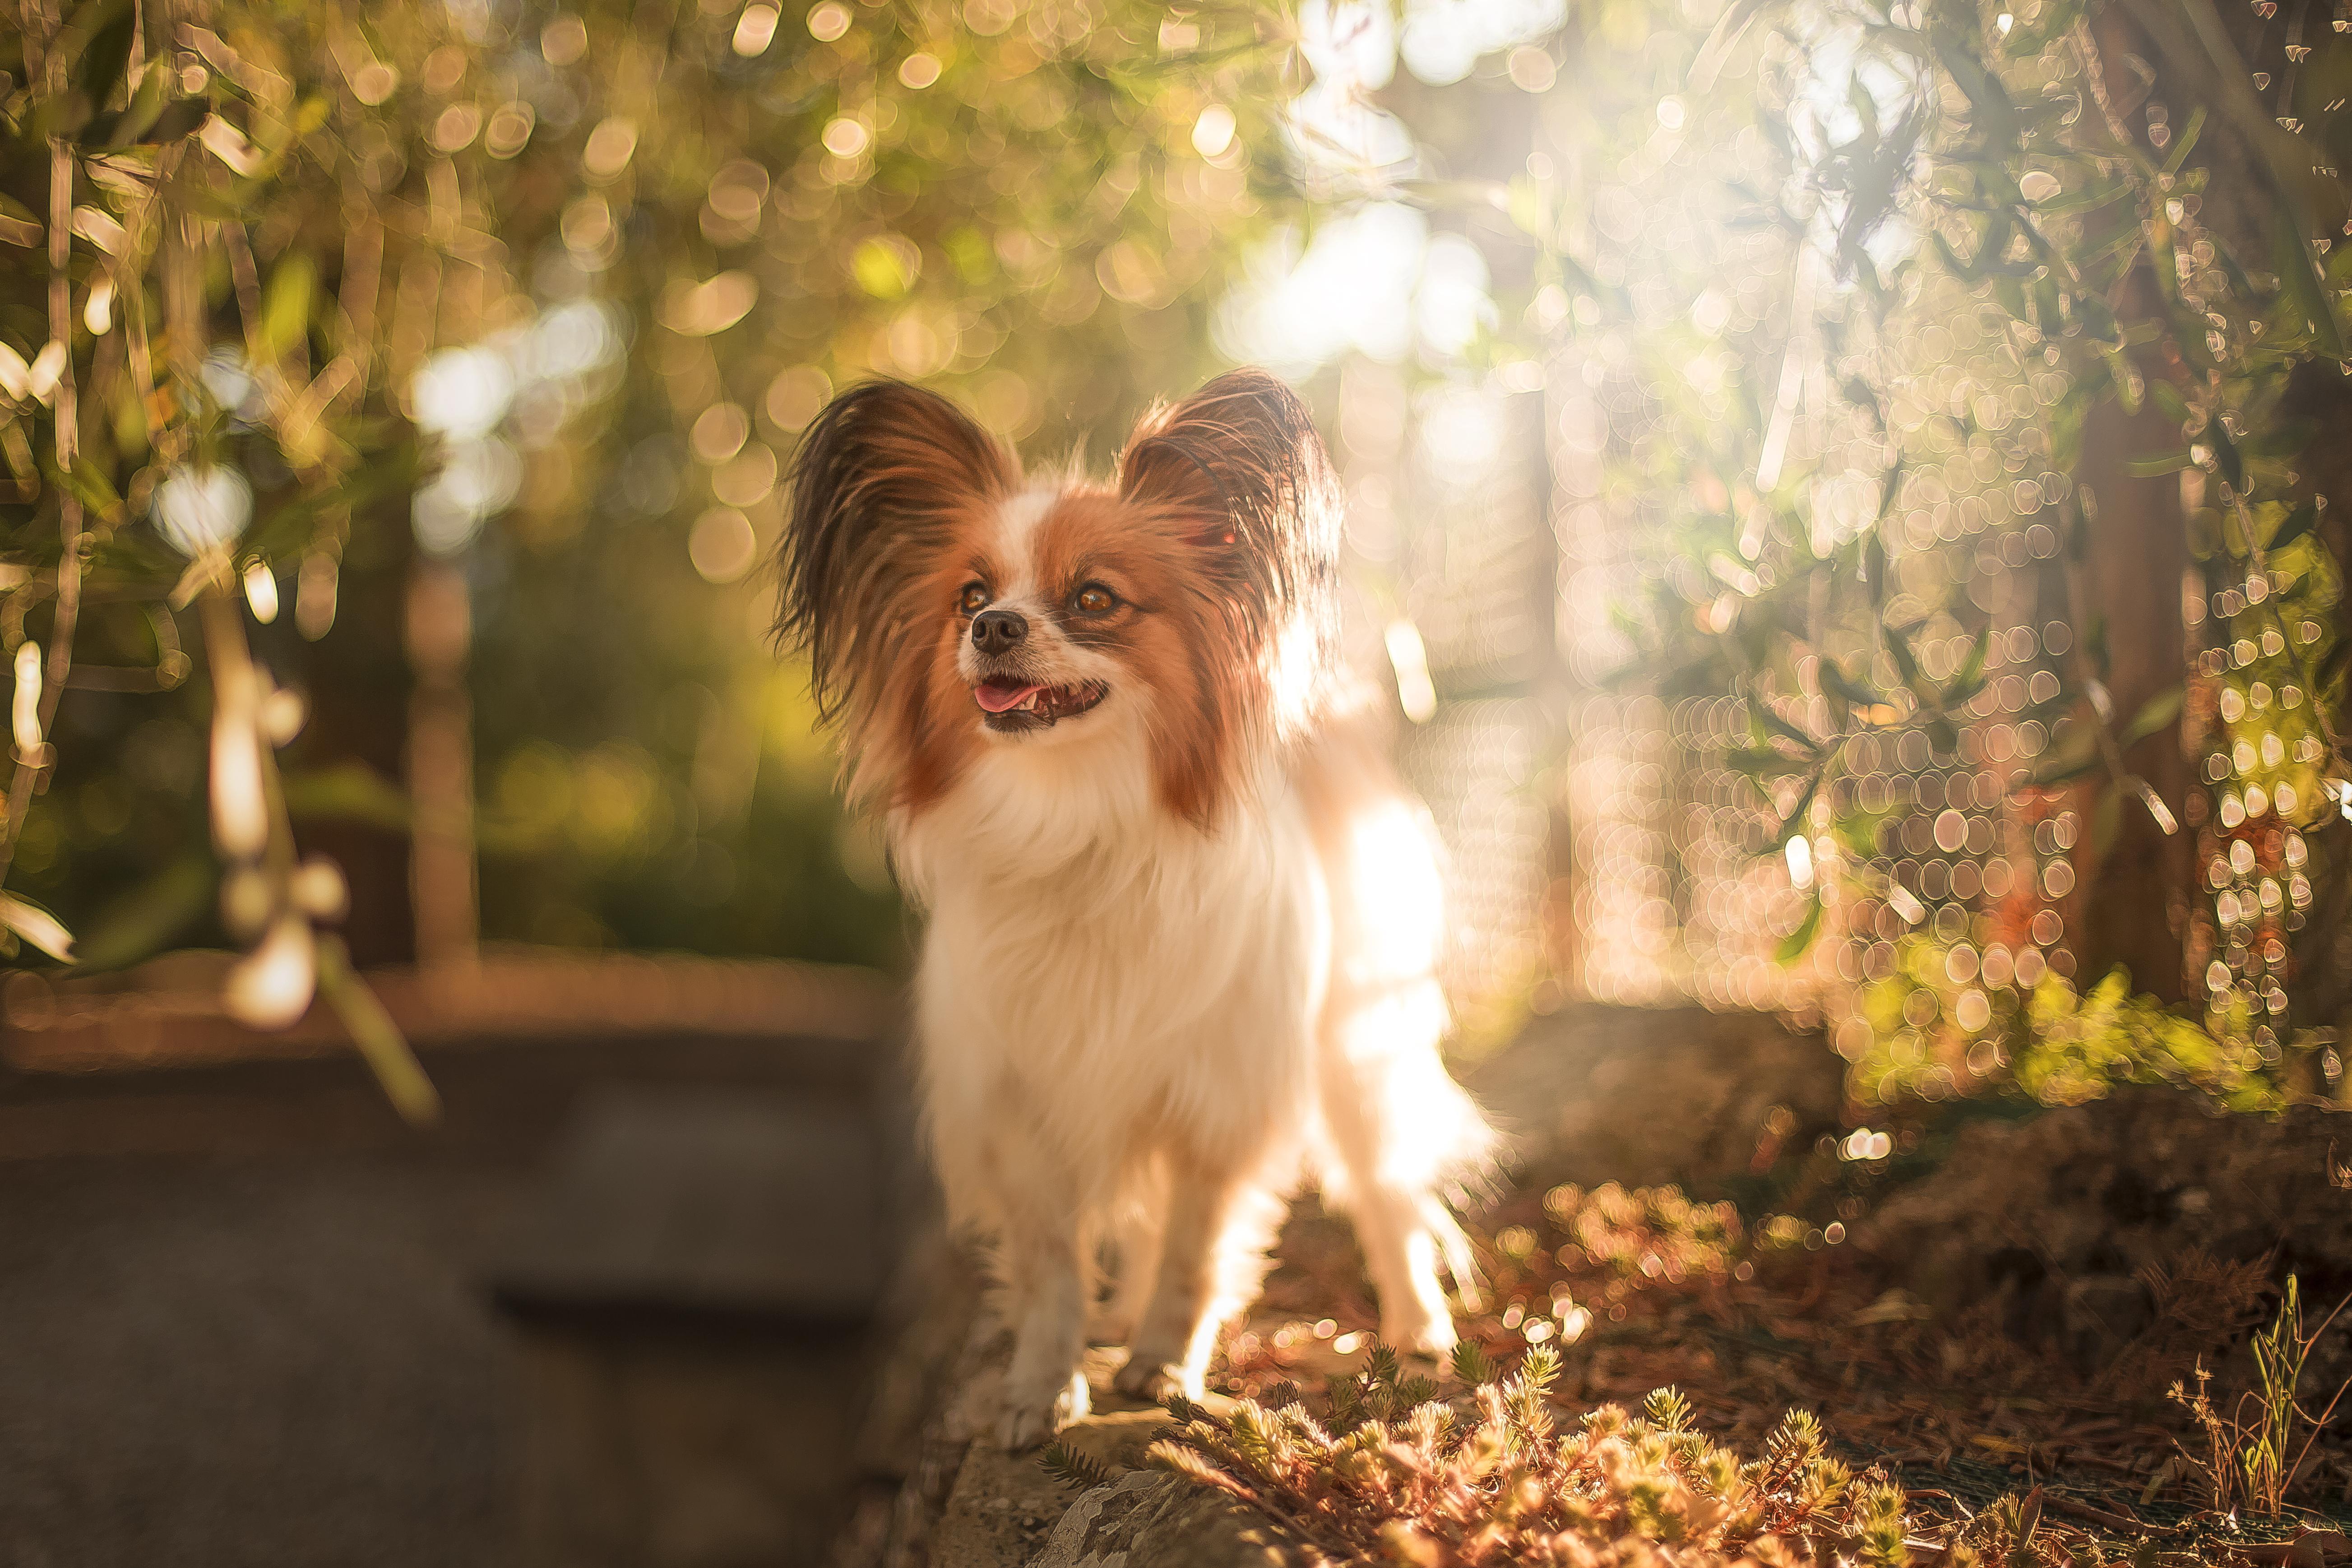 Butterfly dog portrait